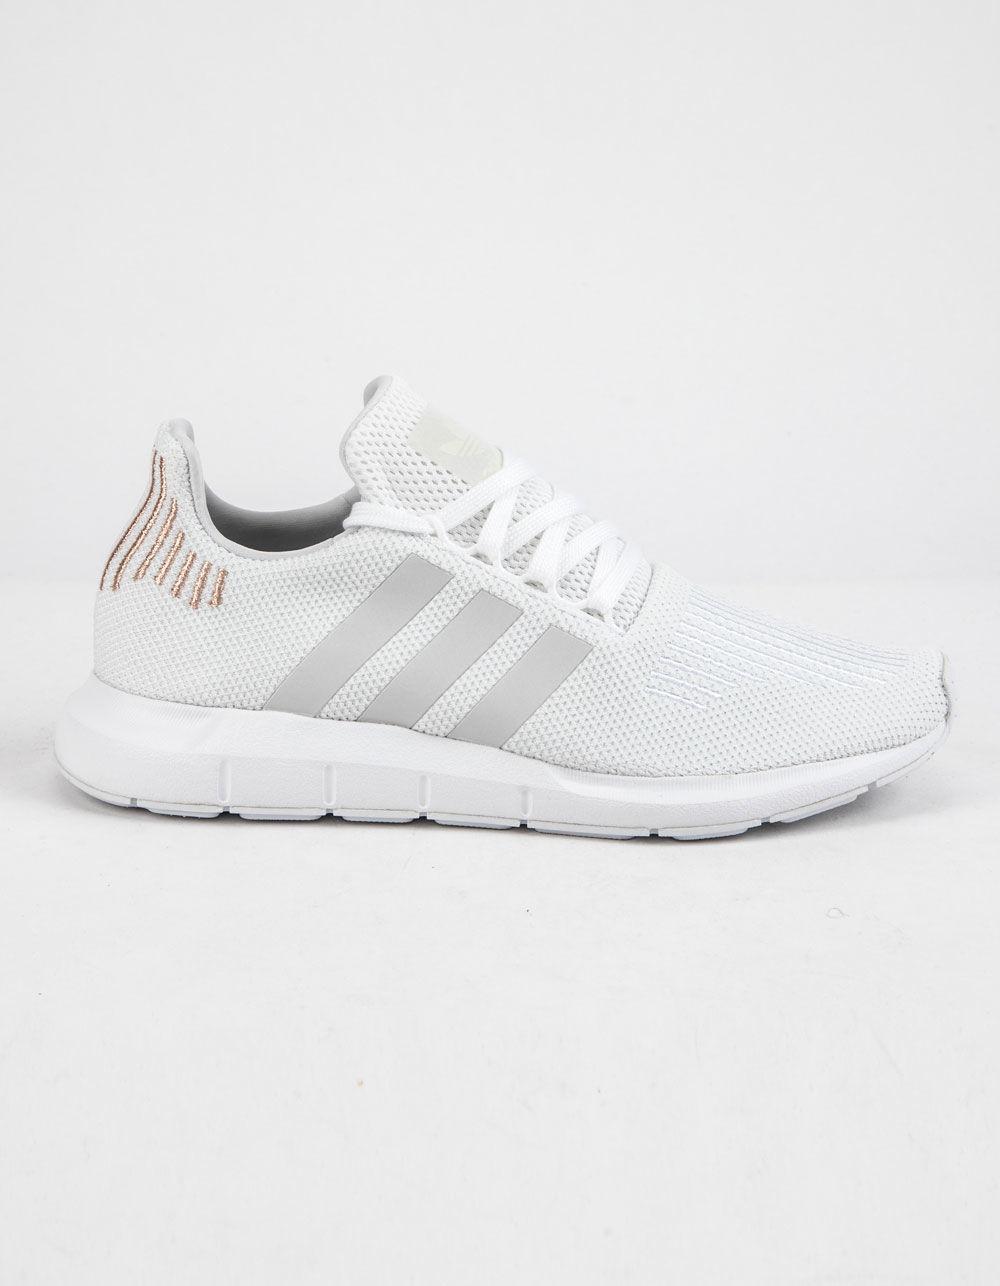 new concept cc4e8 53d49 Swift Run Cloud White & Crystal White Womens Shoes